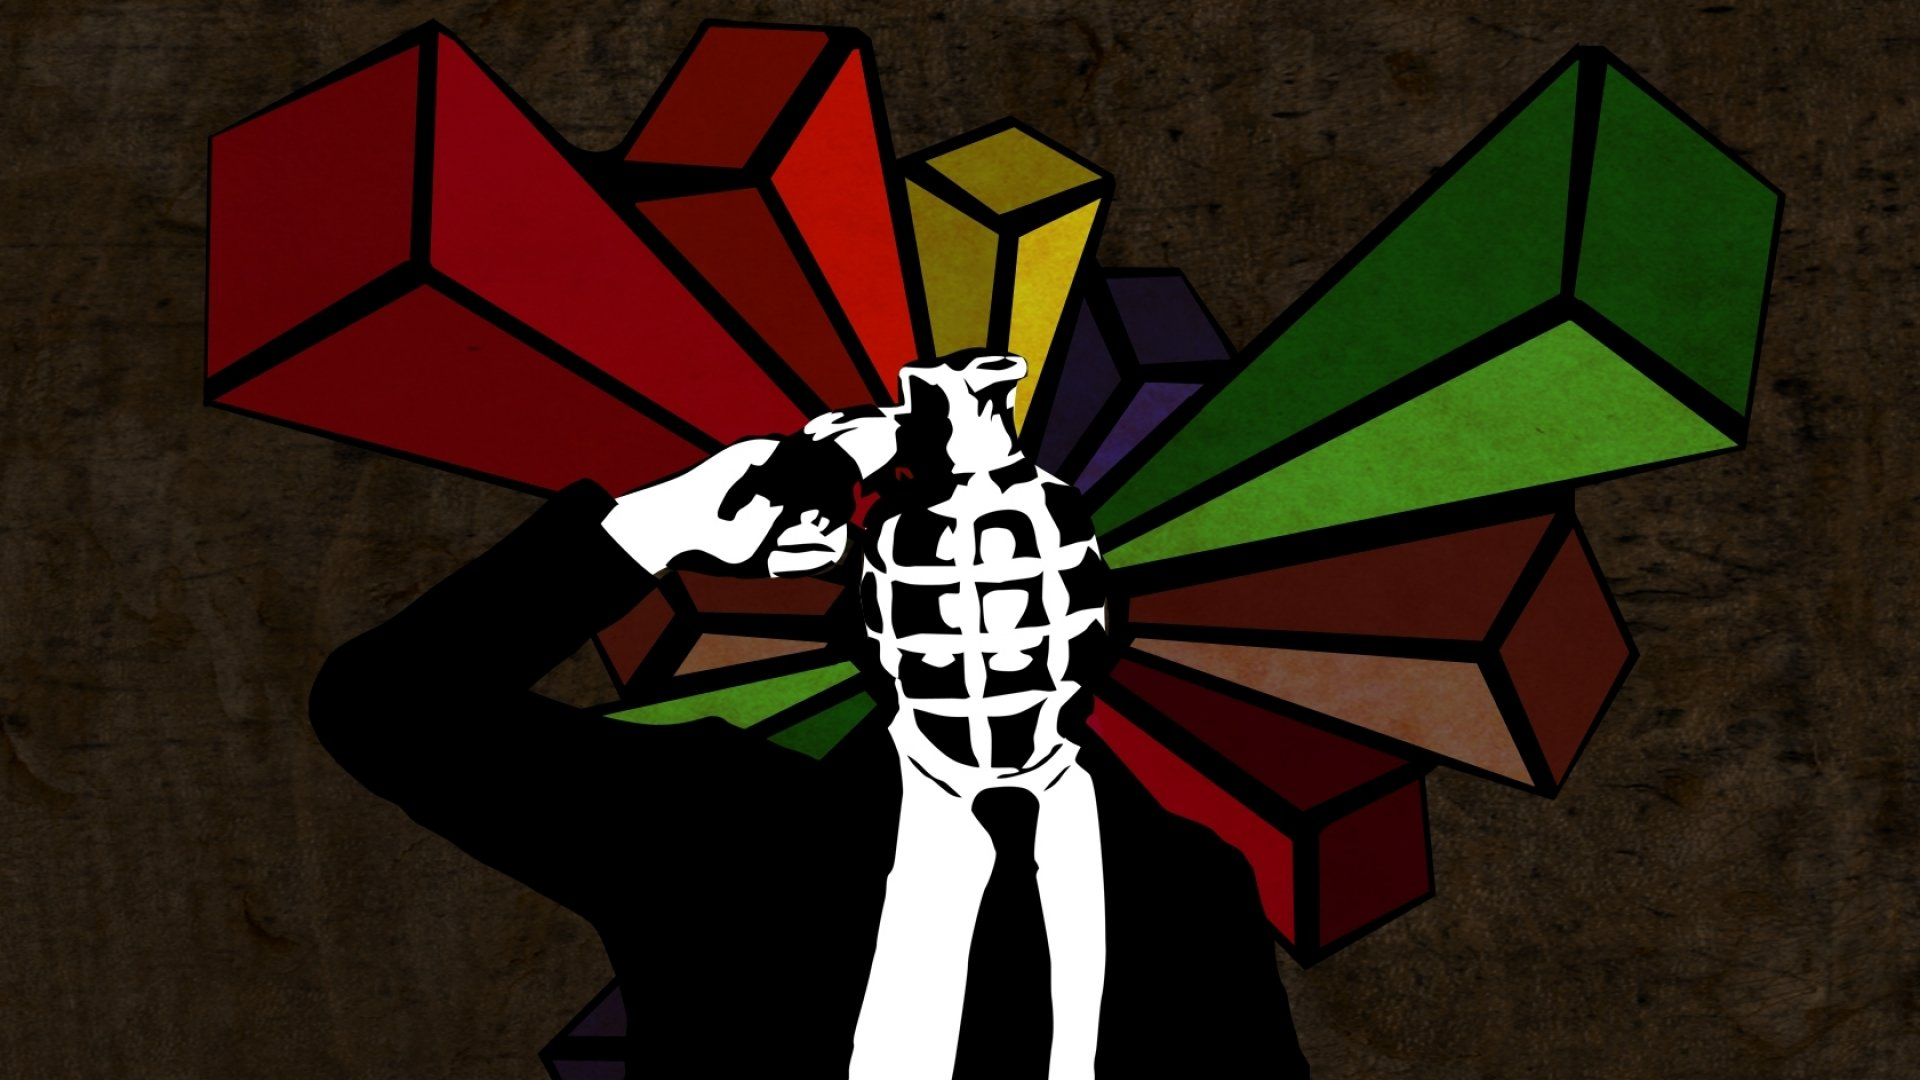 Anonymous Mask Wallpaper 3d Anonymous Mask Sadic Dark Anarchy Hacker Hacking Vendetta